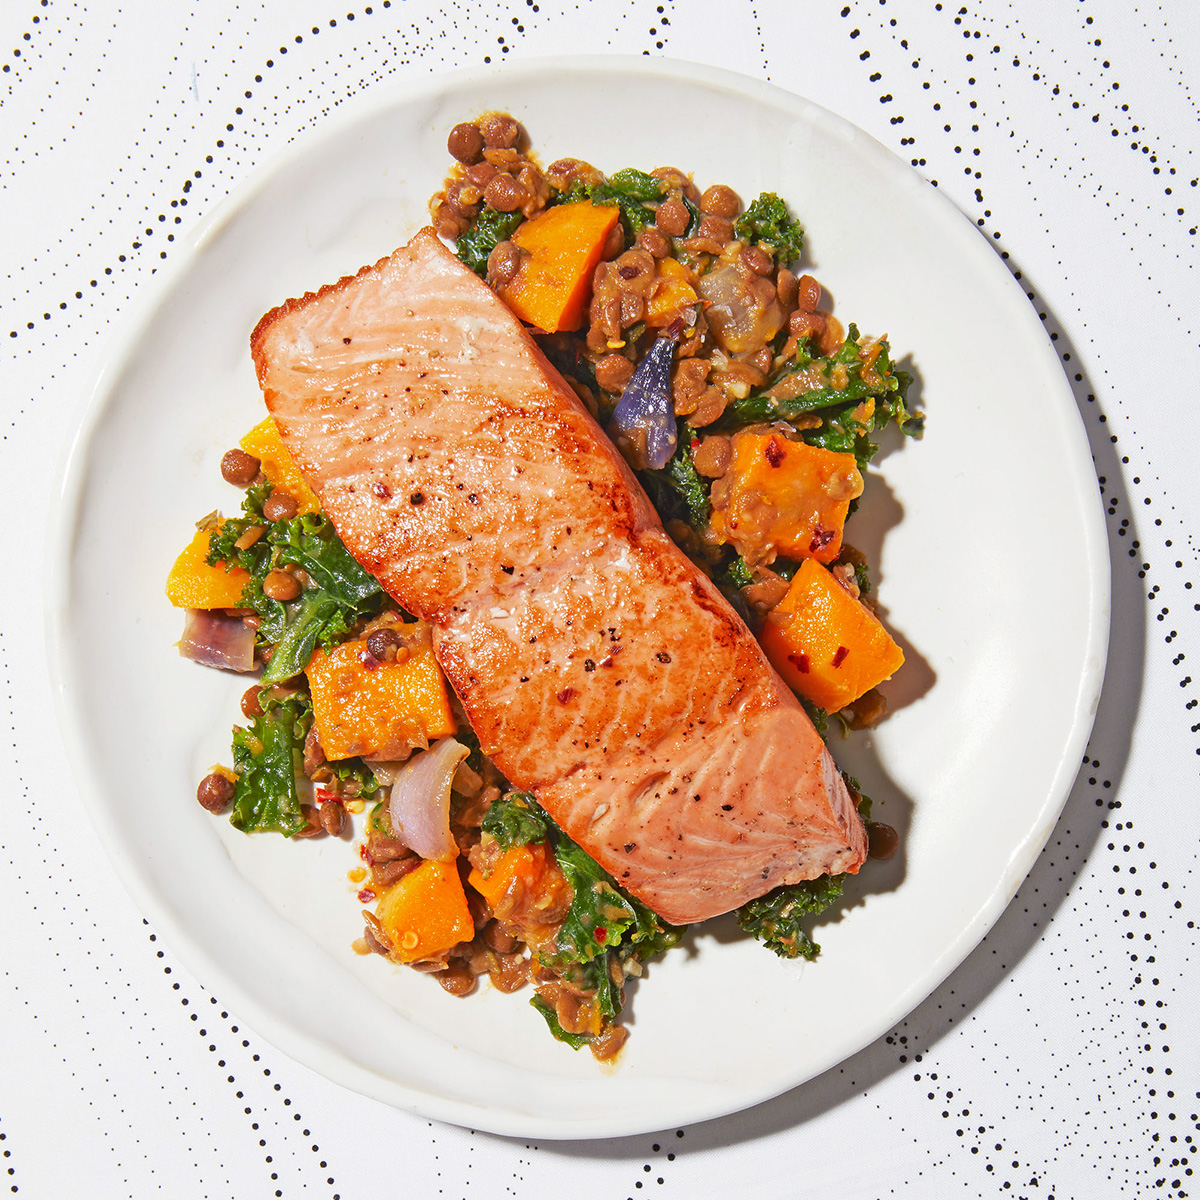 seared salmon over lentils